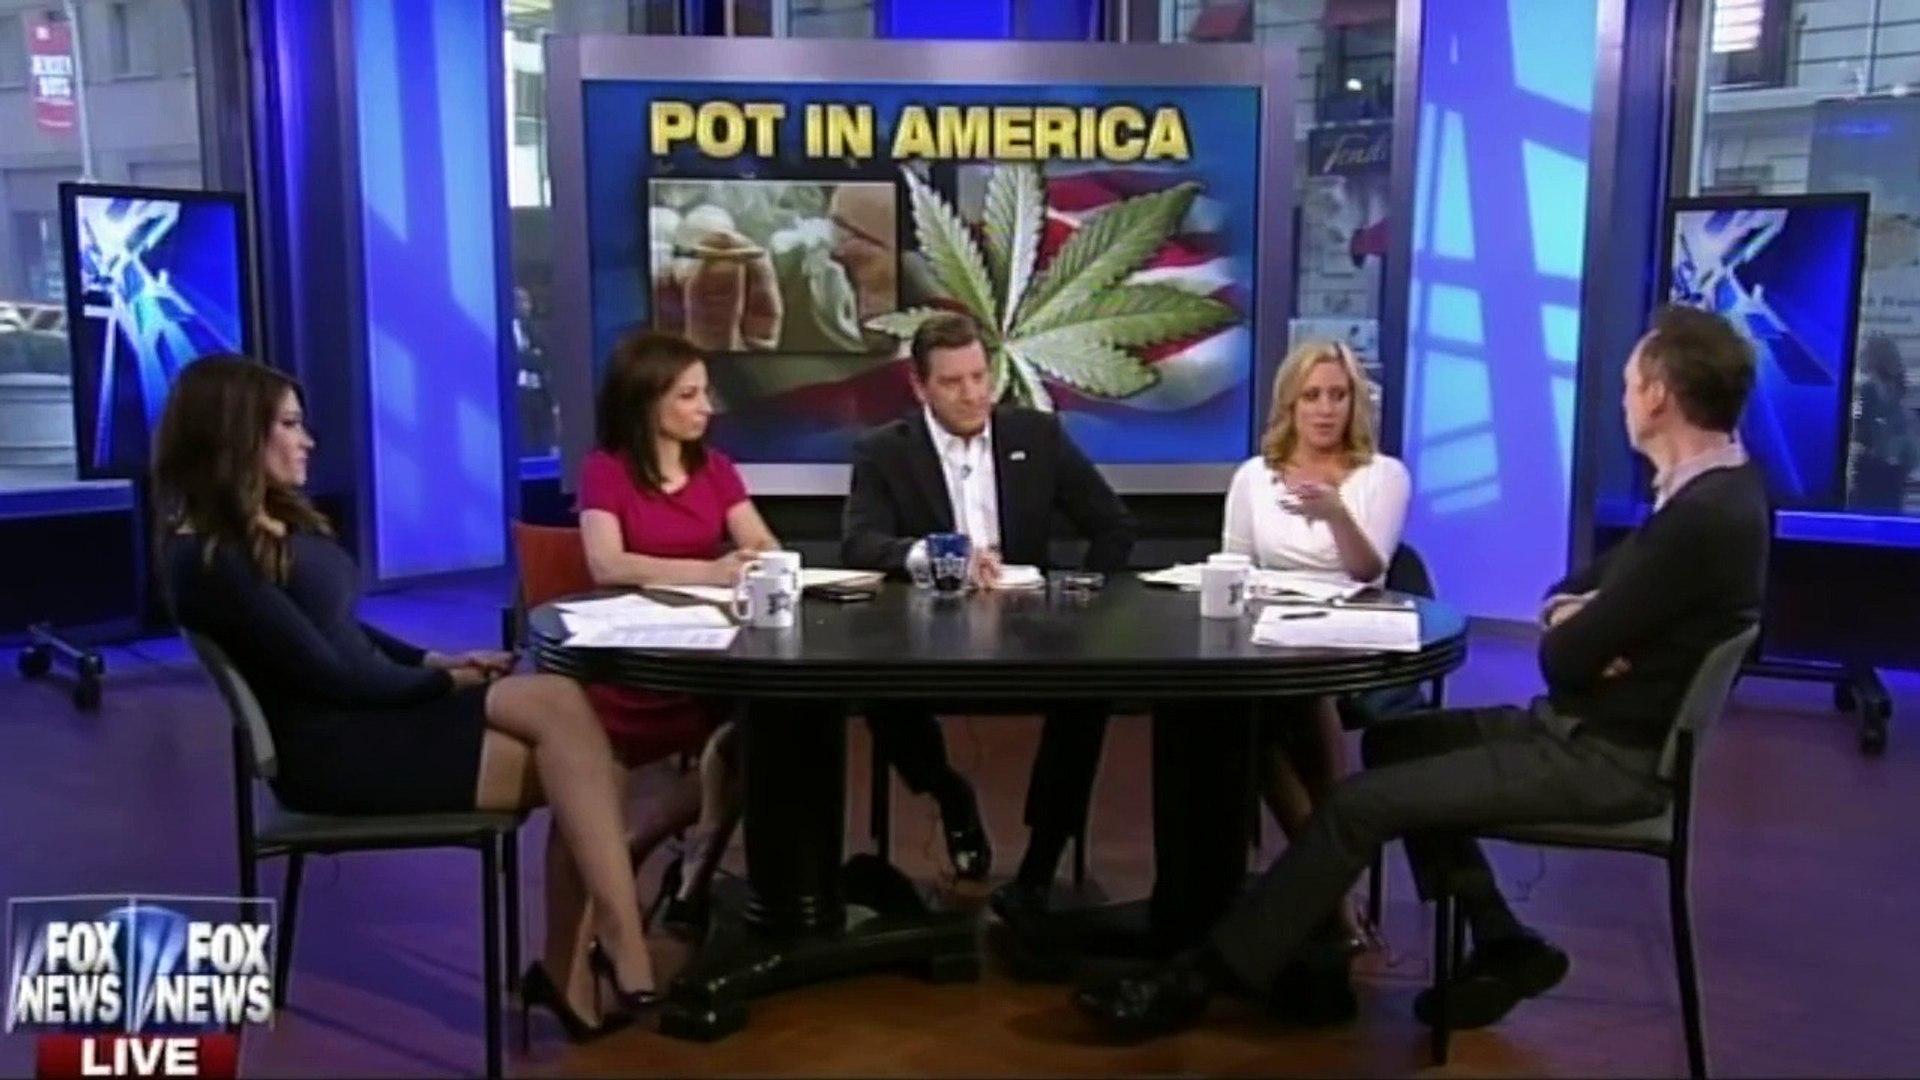 Fox News: Pot Politics